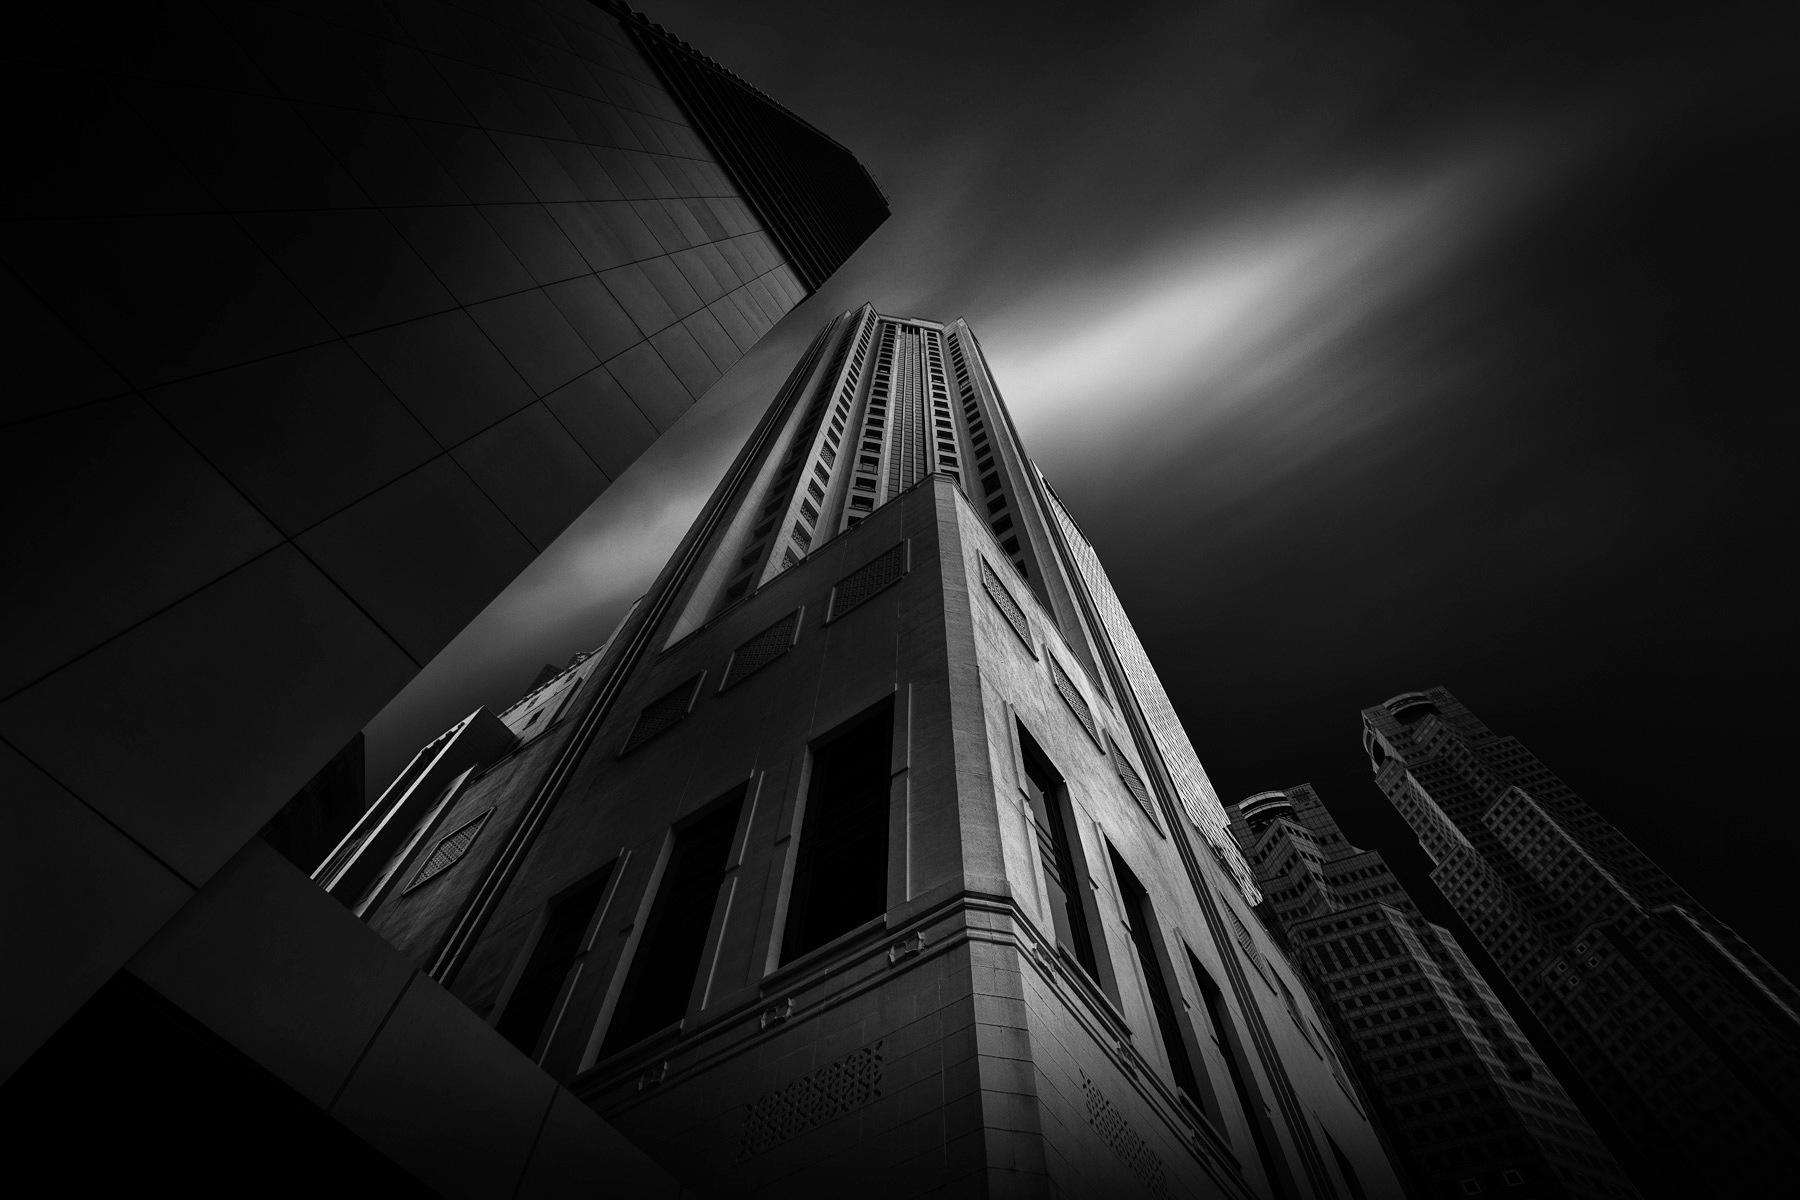 Gotham by Chelian